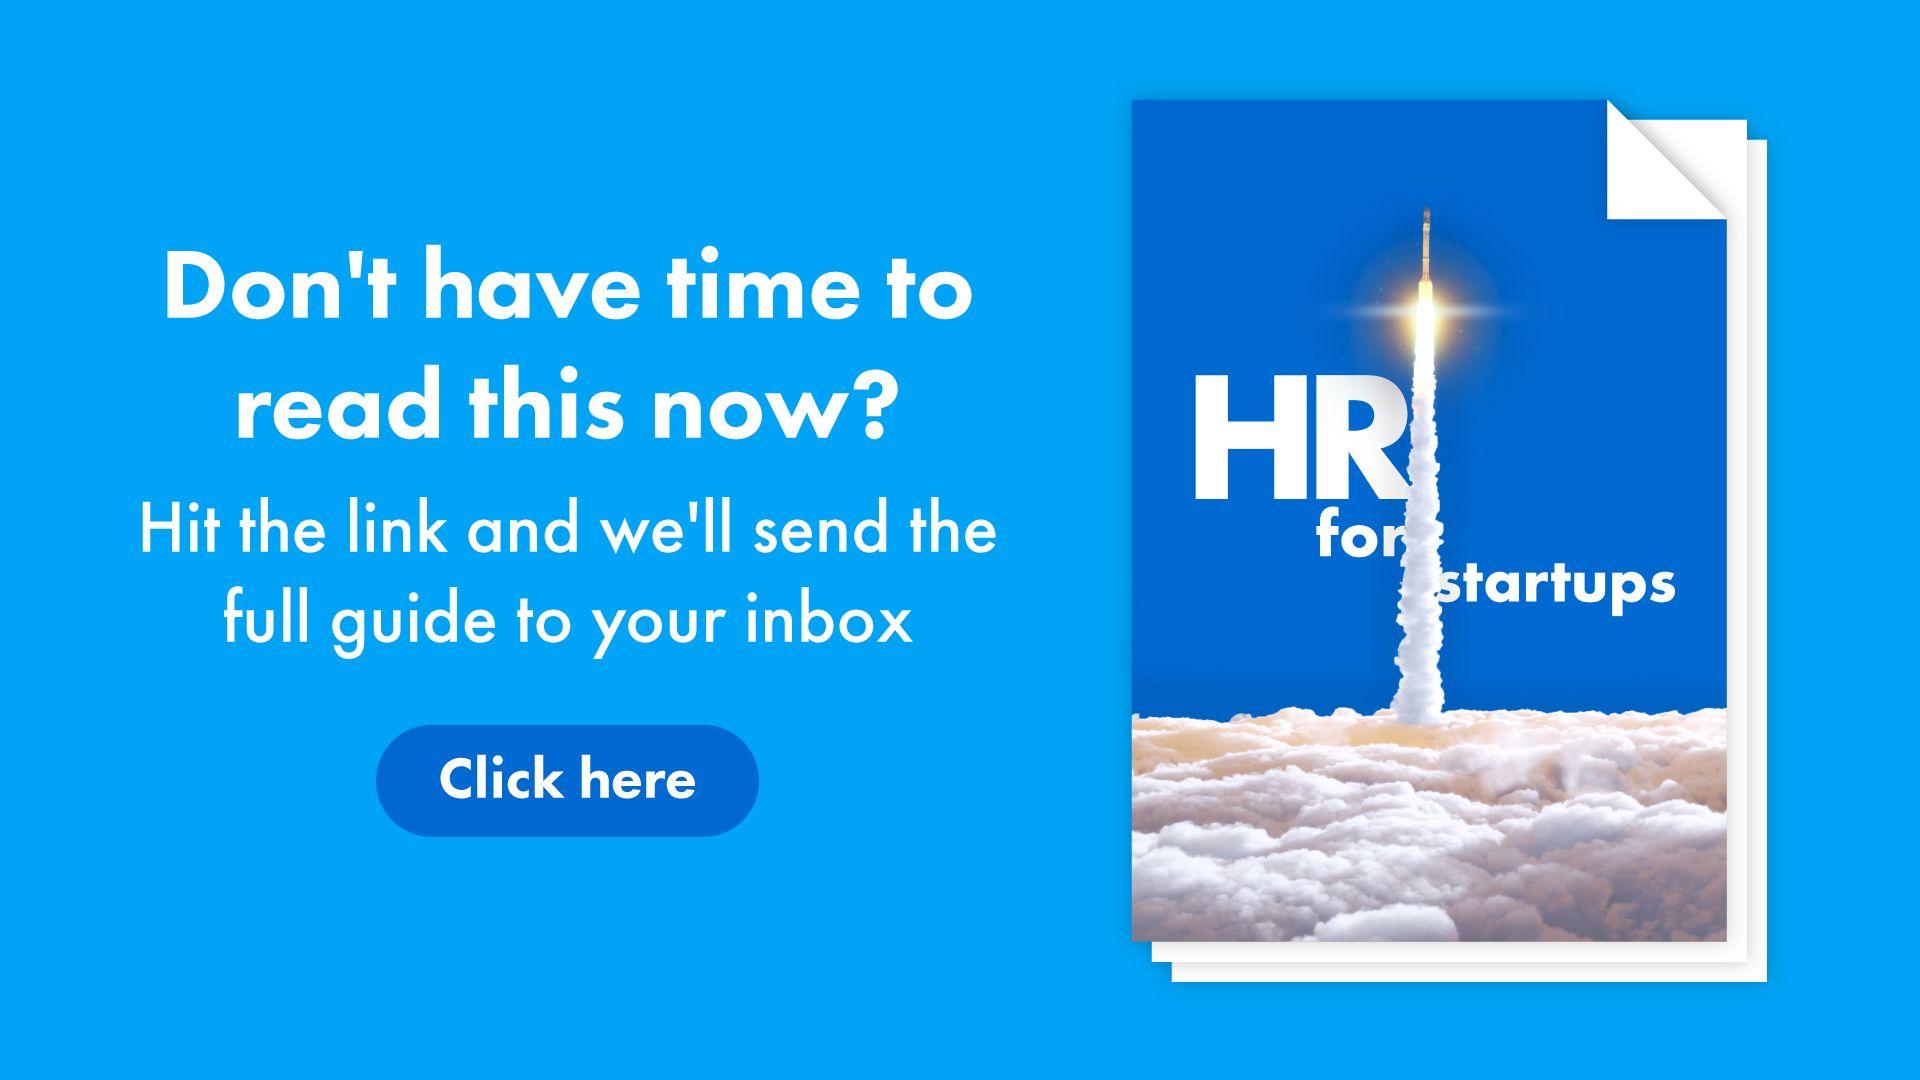 hr-for-startups-guide-1